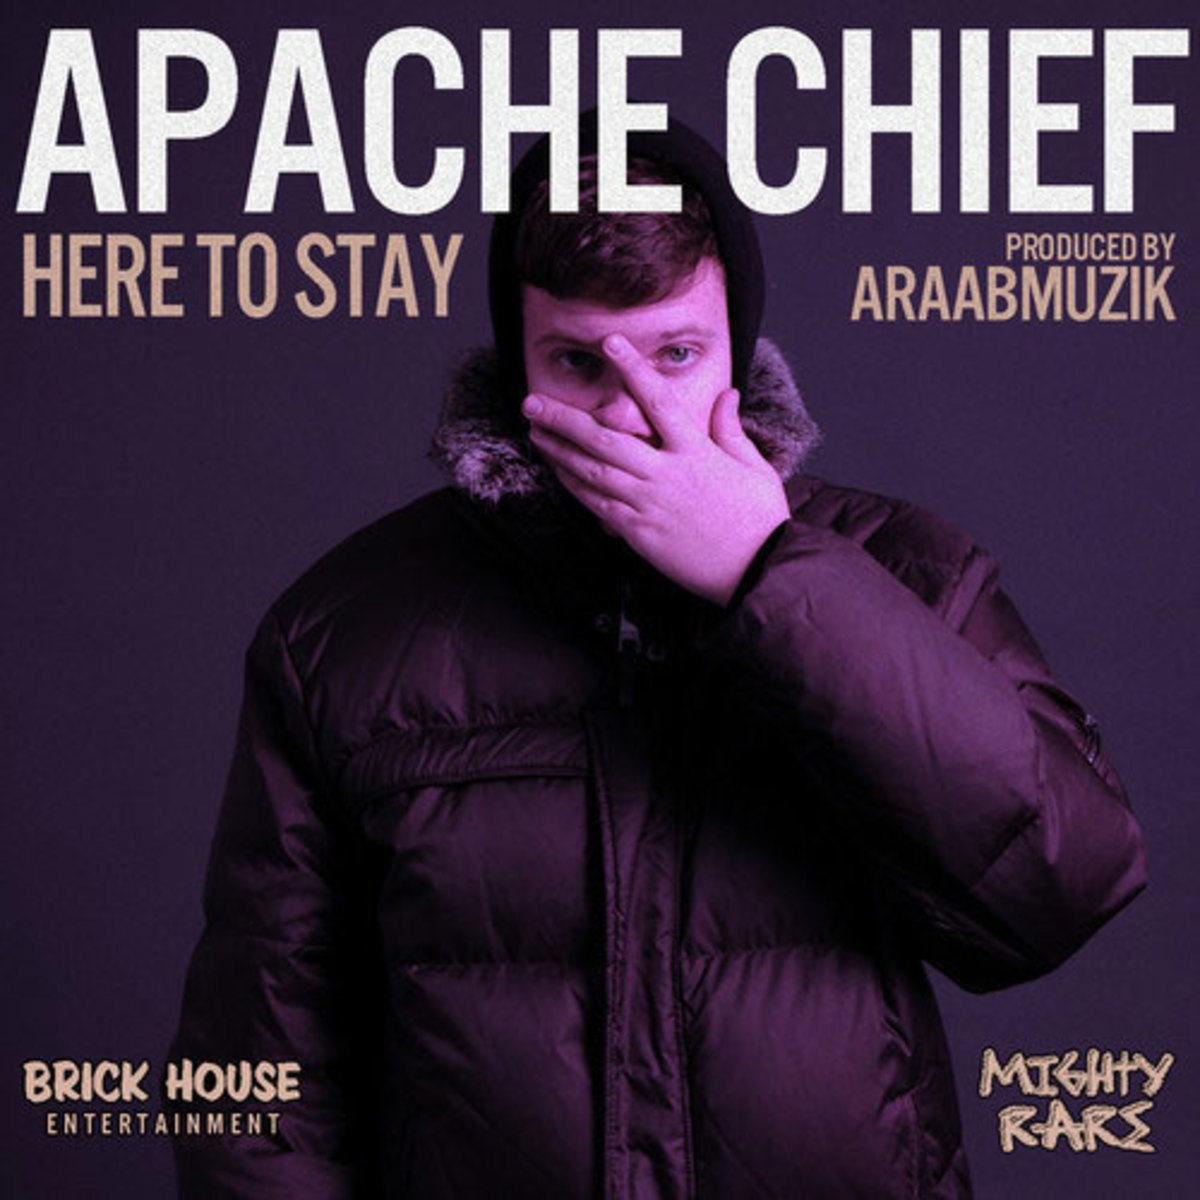 apachechief-heretostay.jpg